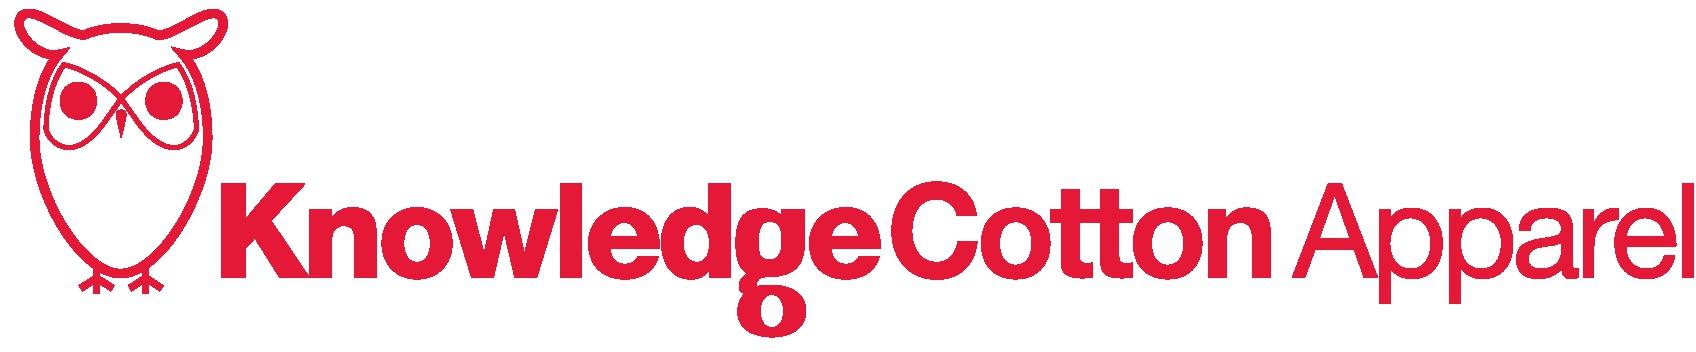 Knowledge Cotton Apparel Standard Logo 02 1 - Nos Marques